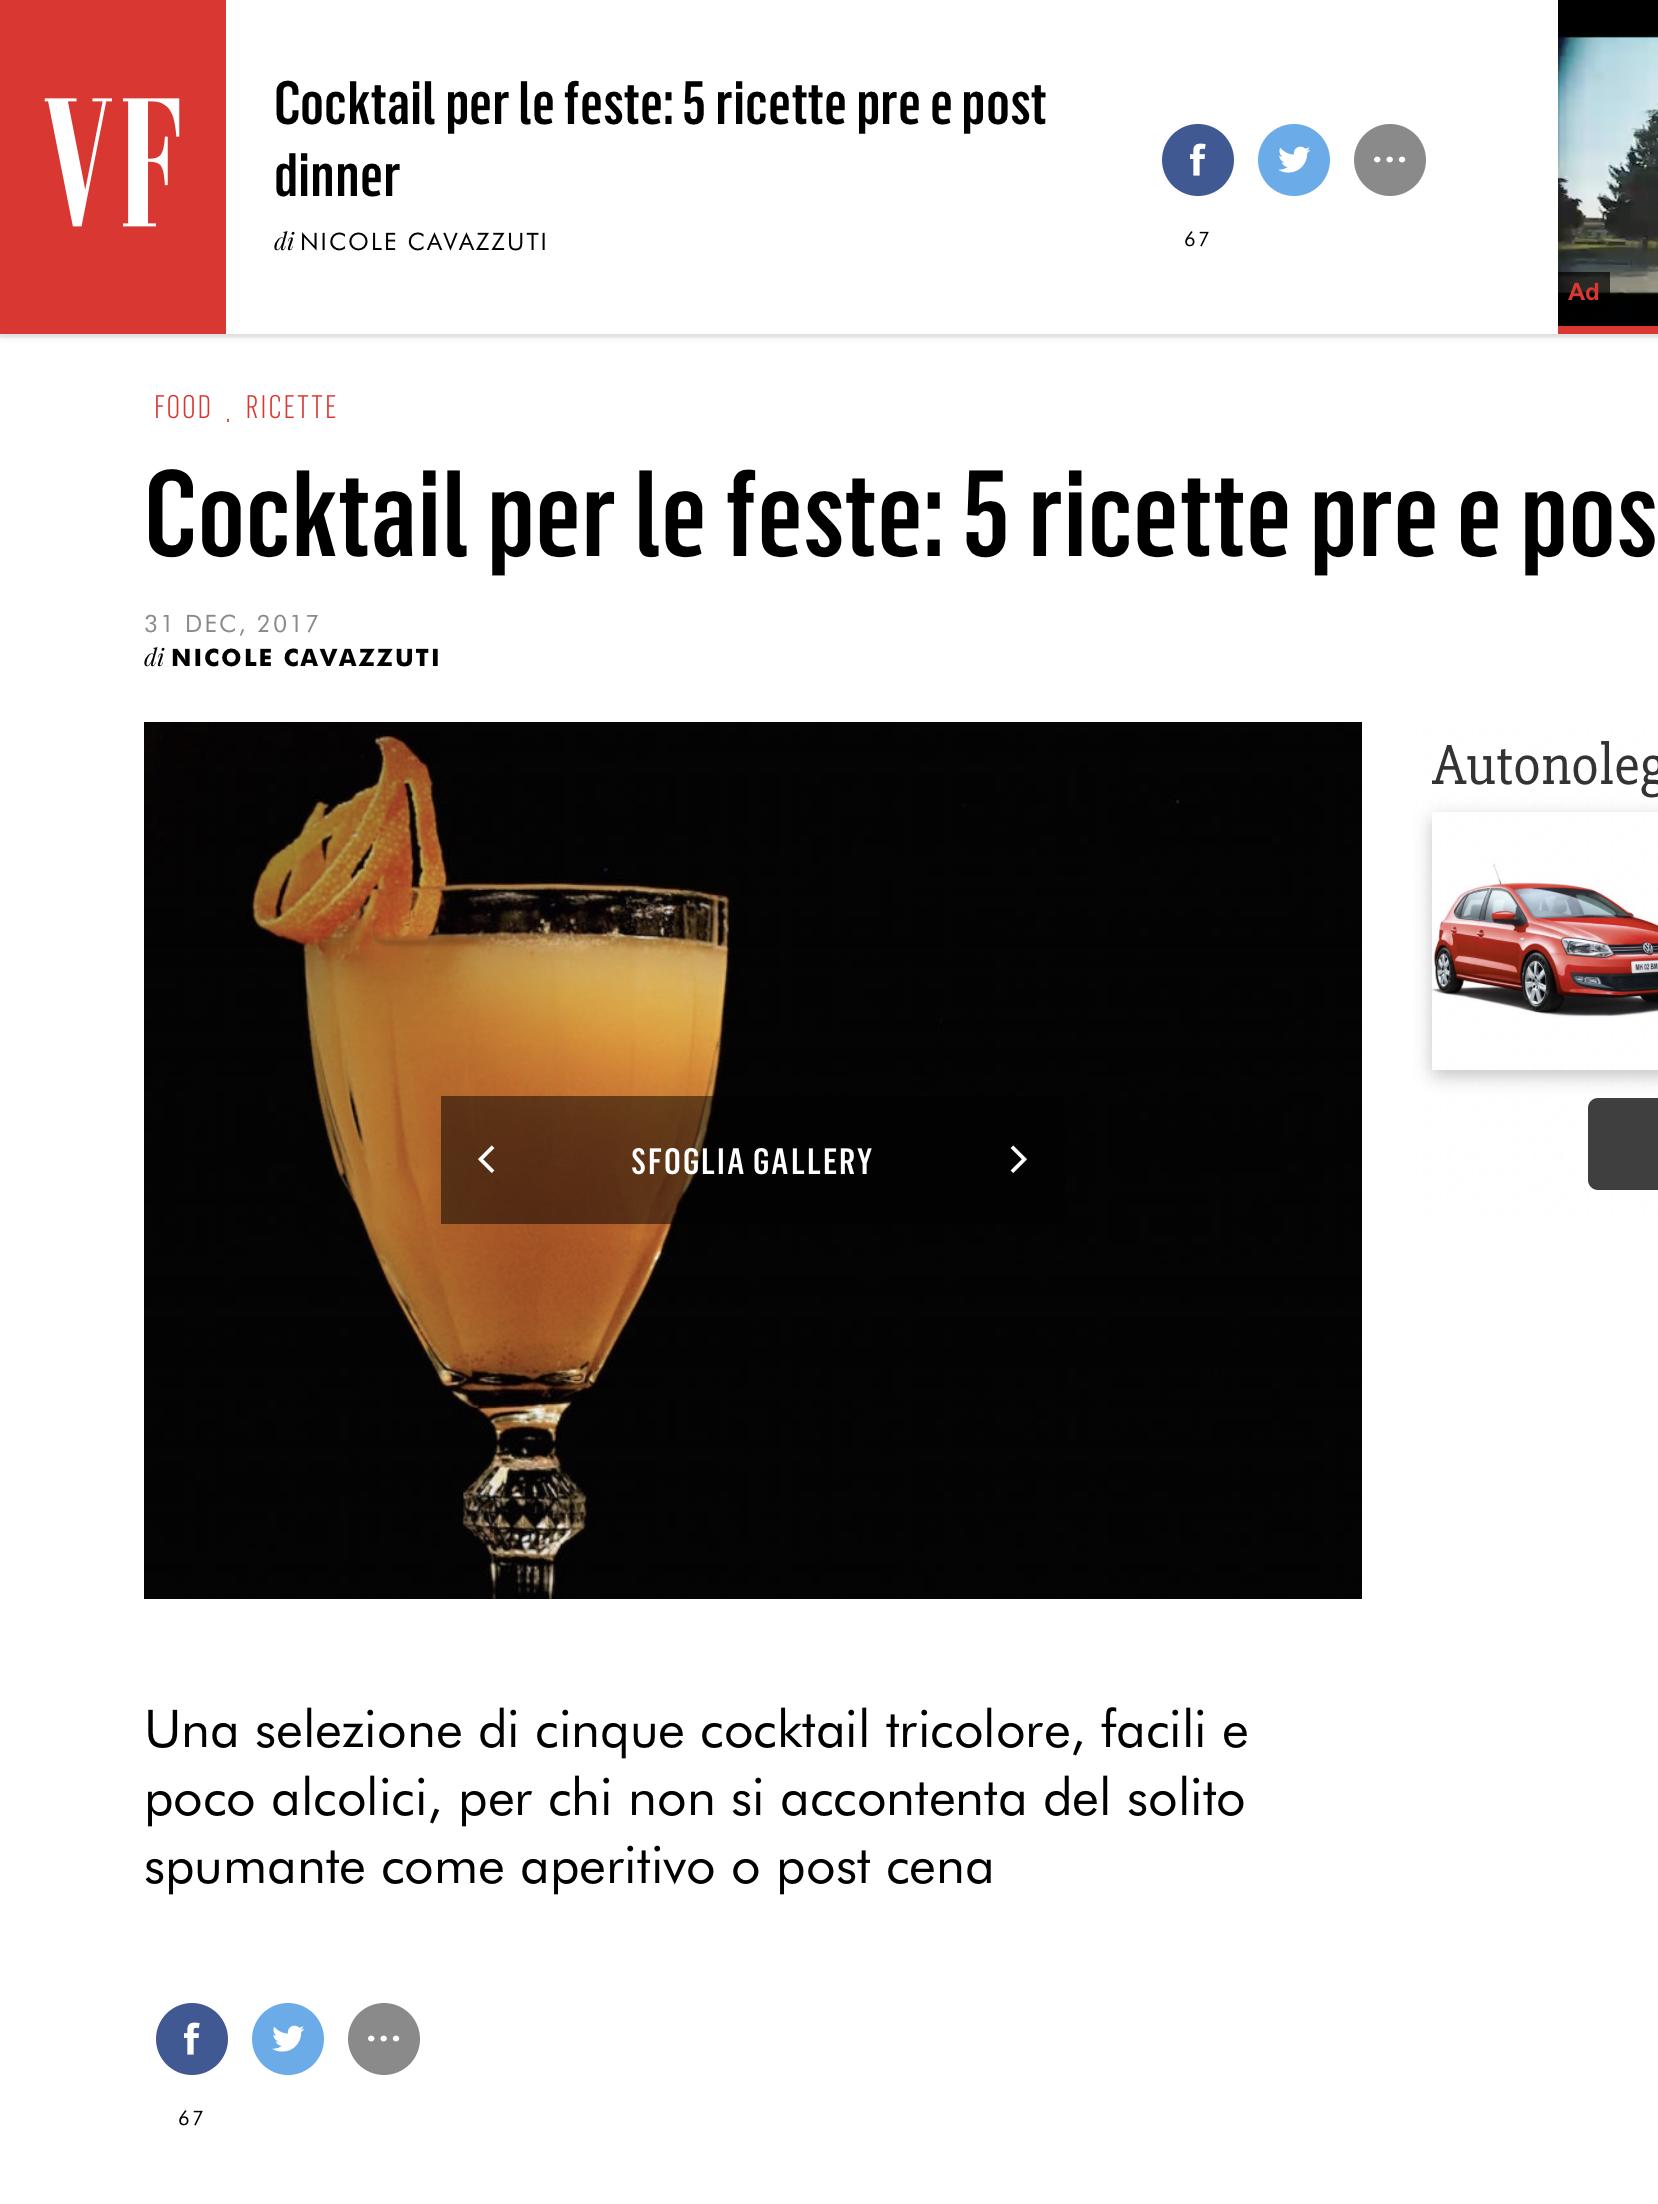 5 ricette cocktail